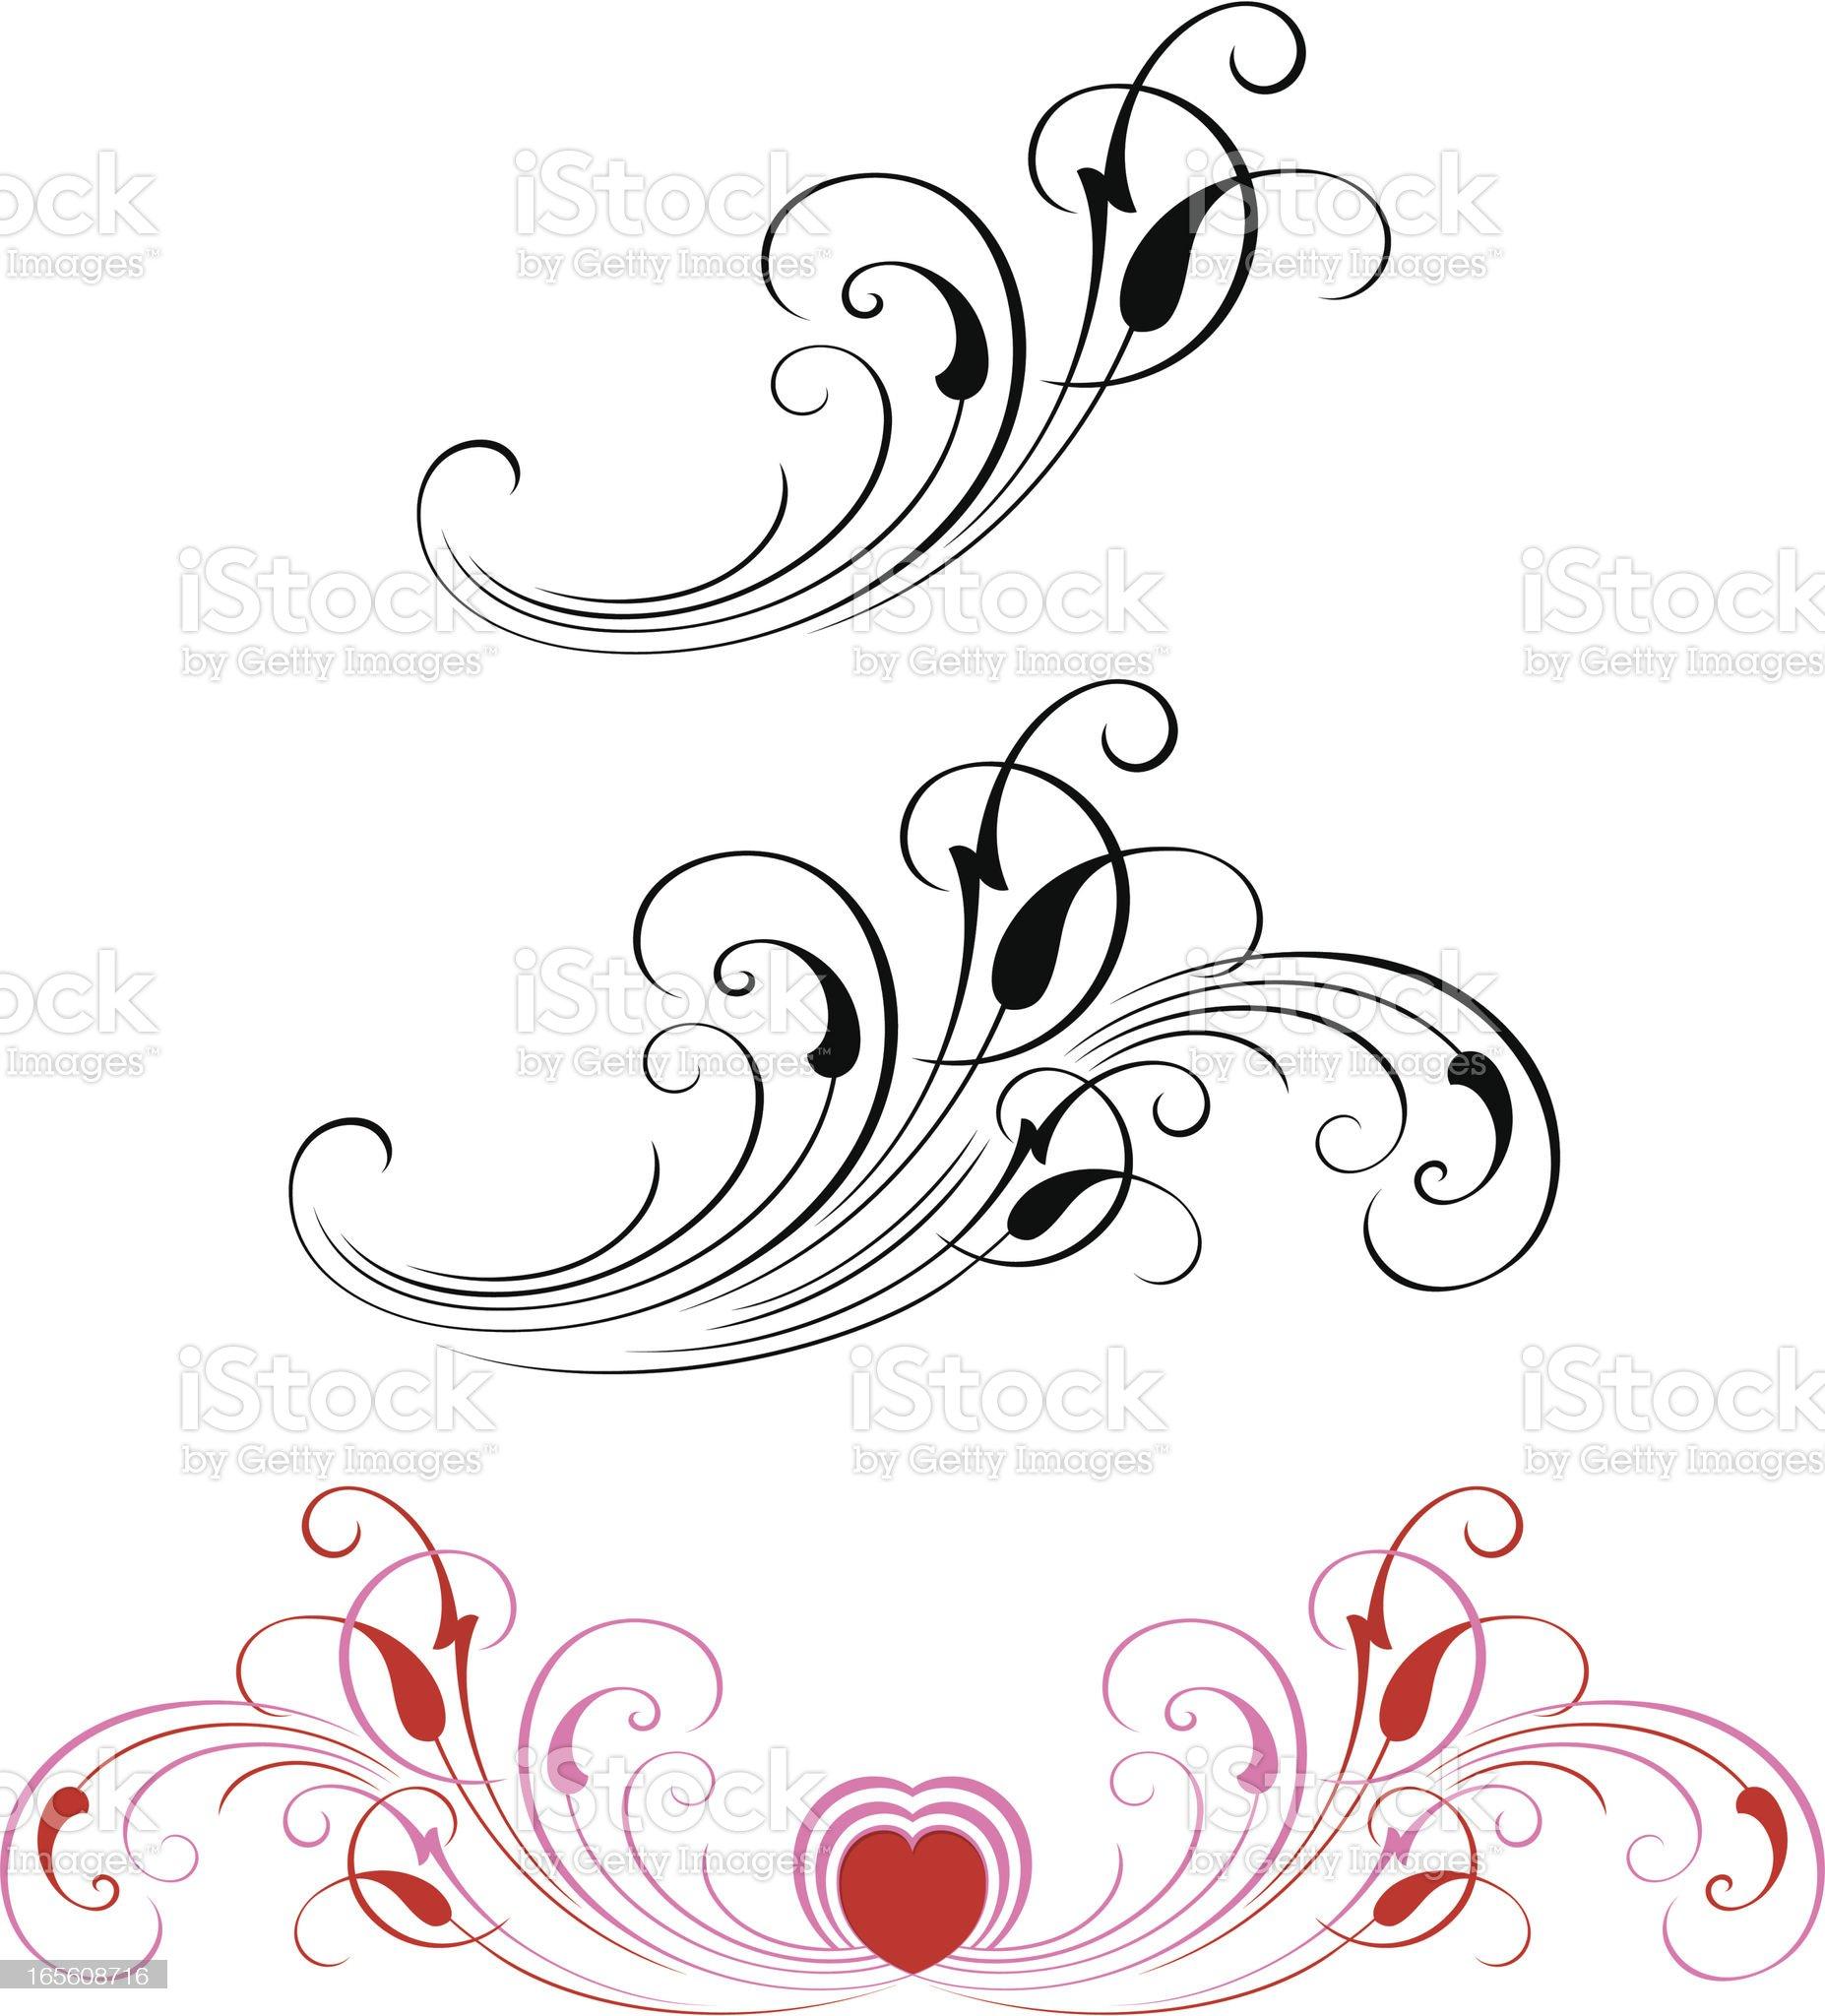 Valentines Scrolls royalty-free stock vector art